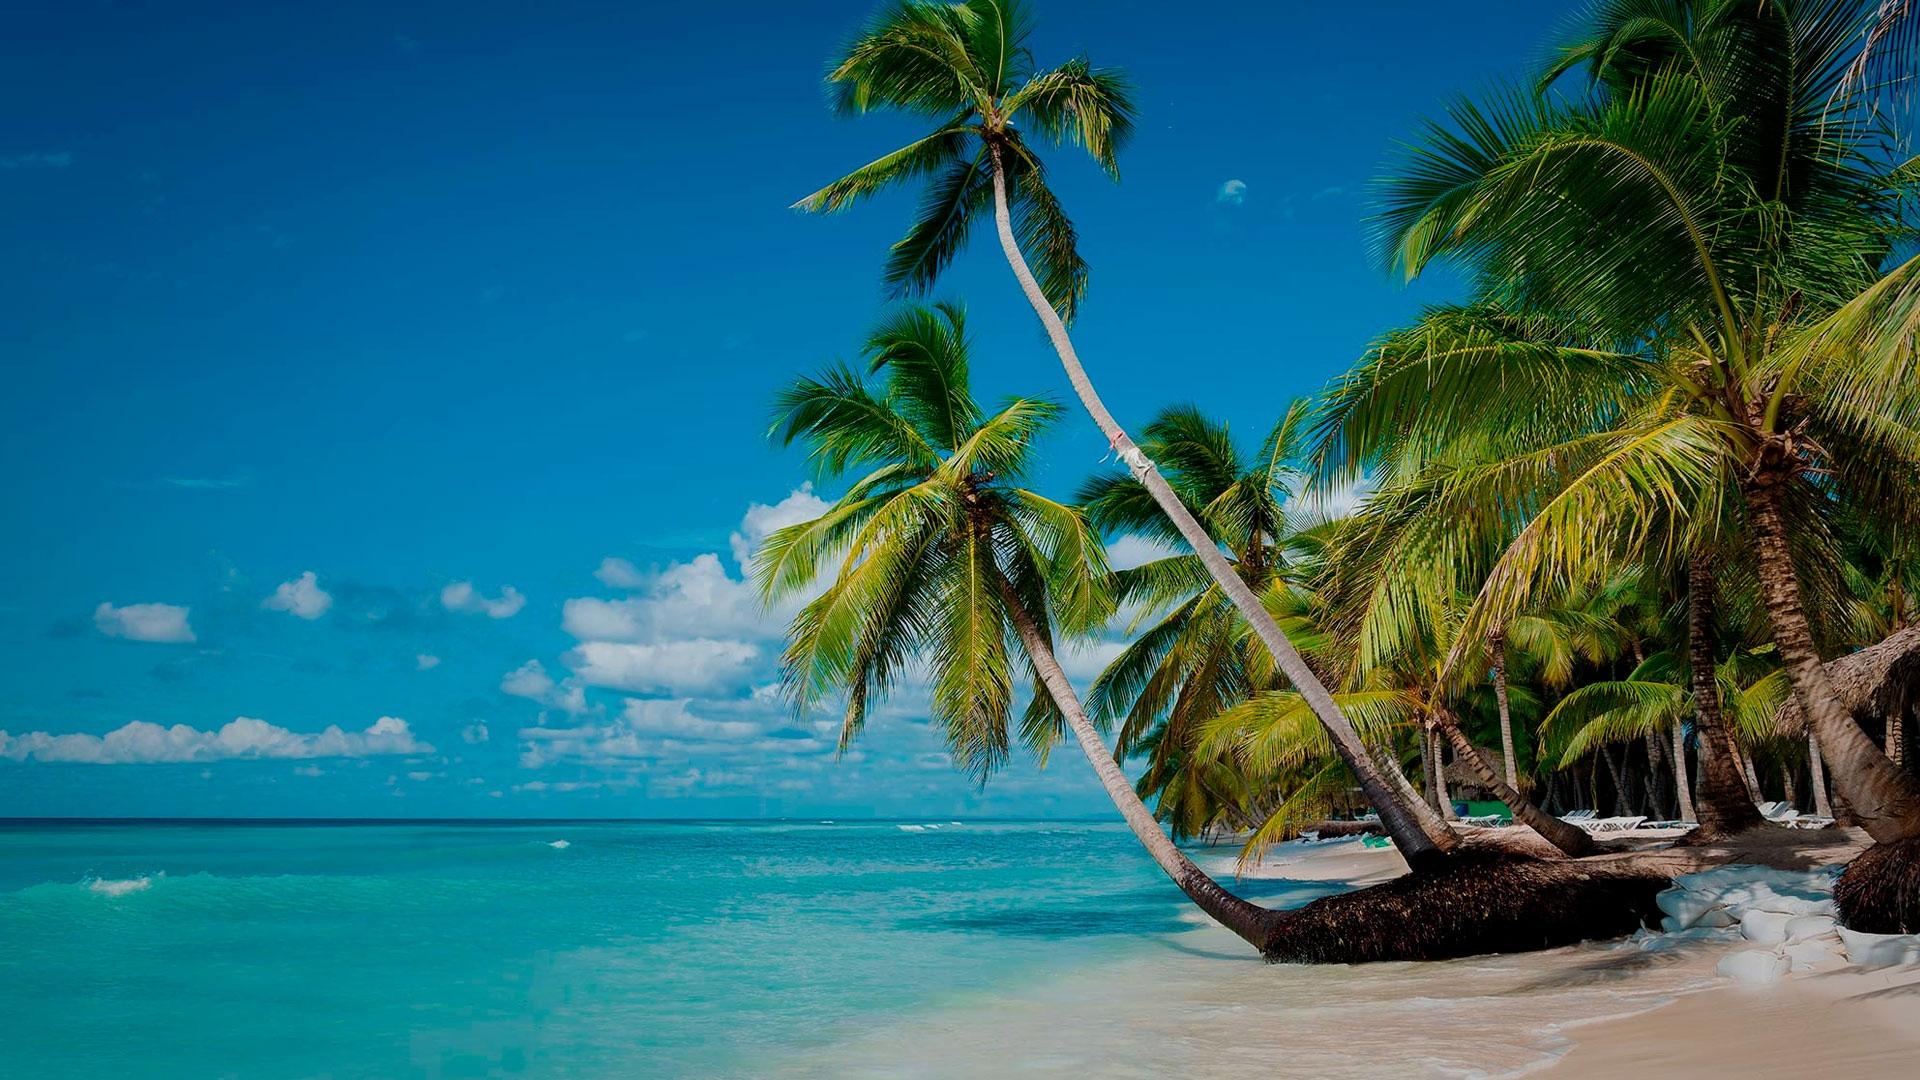 https://www.centraldevacaciones.pt/viajes/assets/upload/d2298.jpg